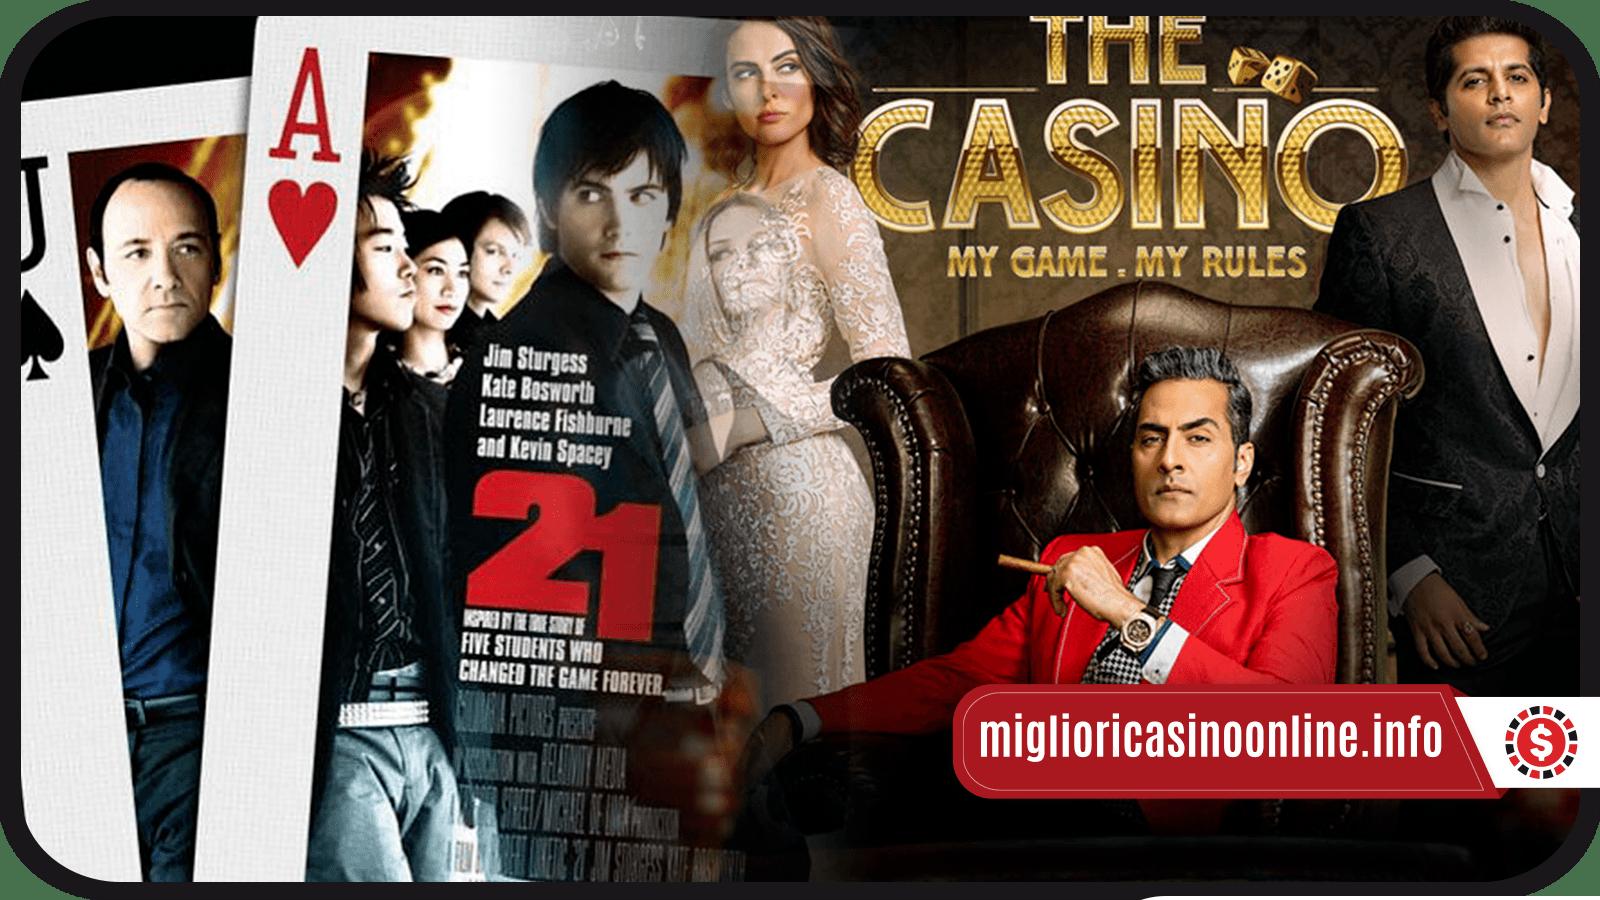 Mbit casino 50 free spins